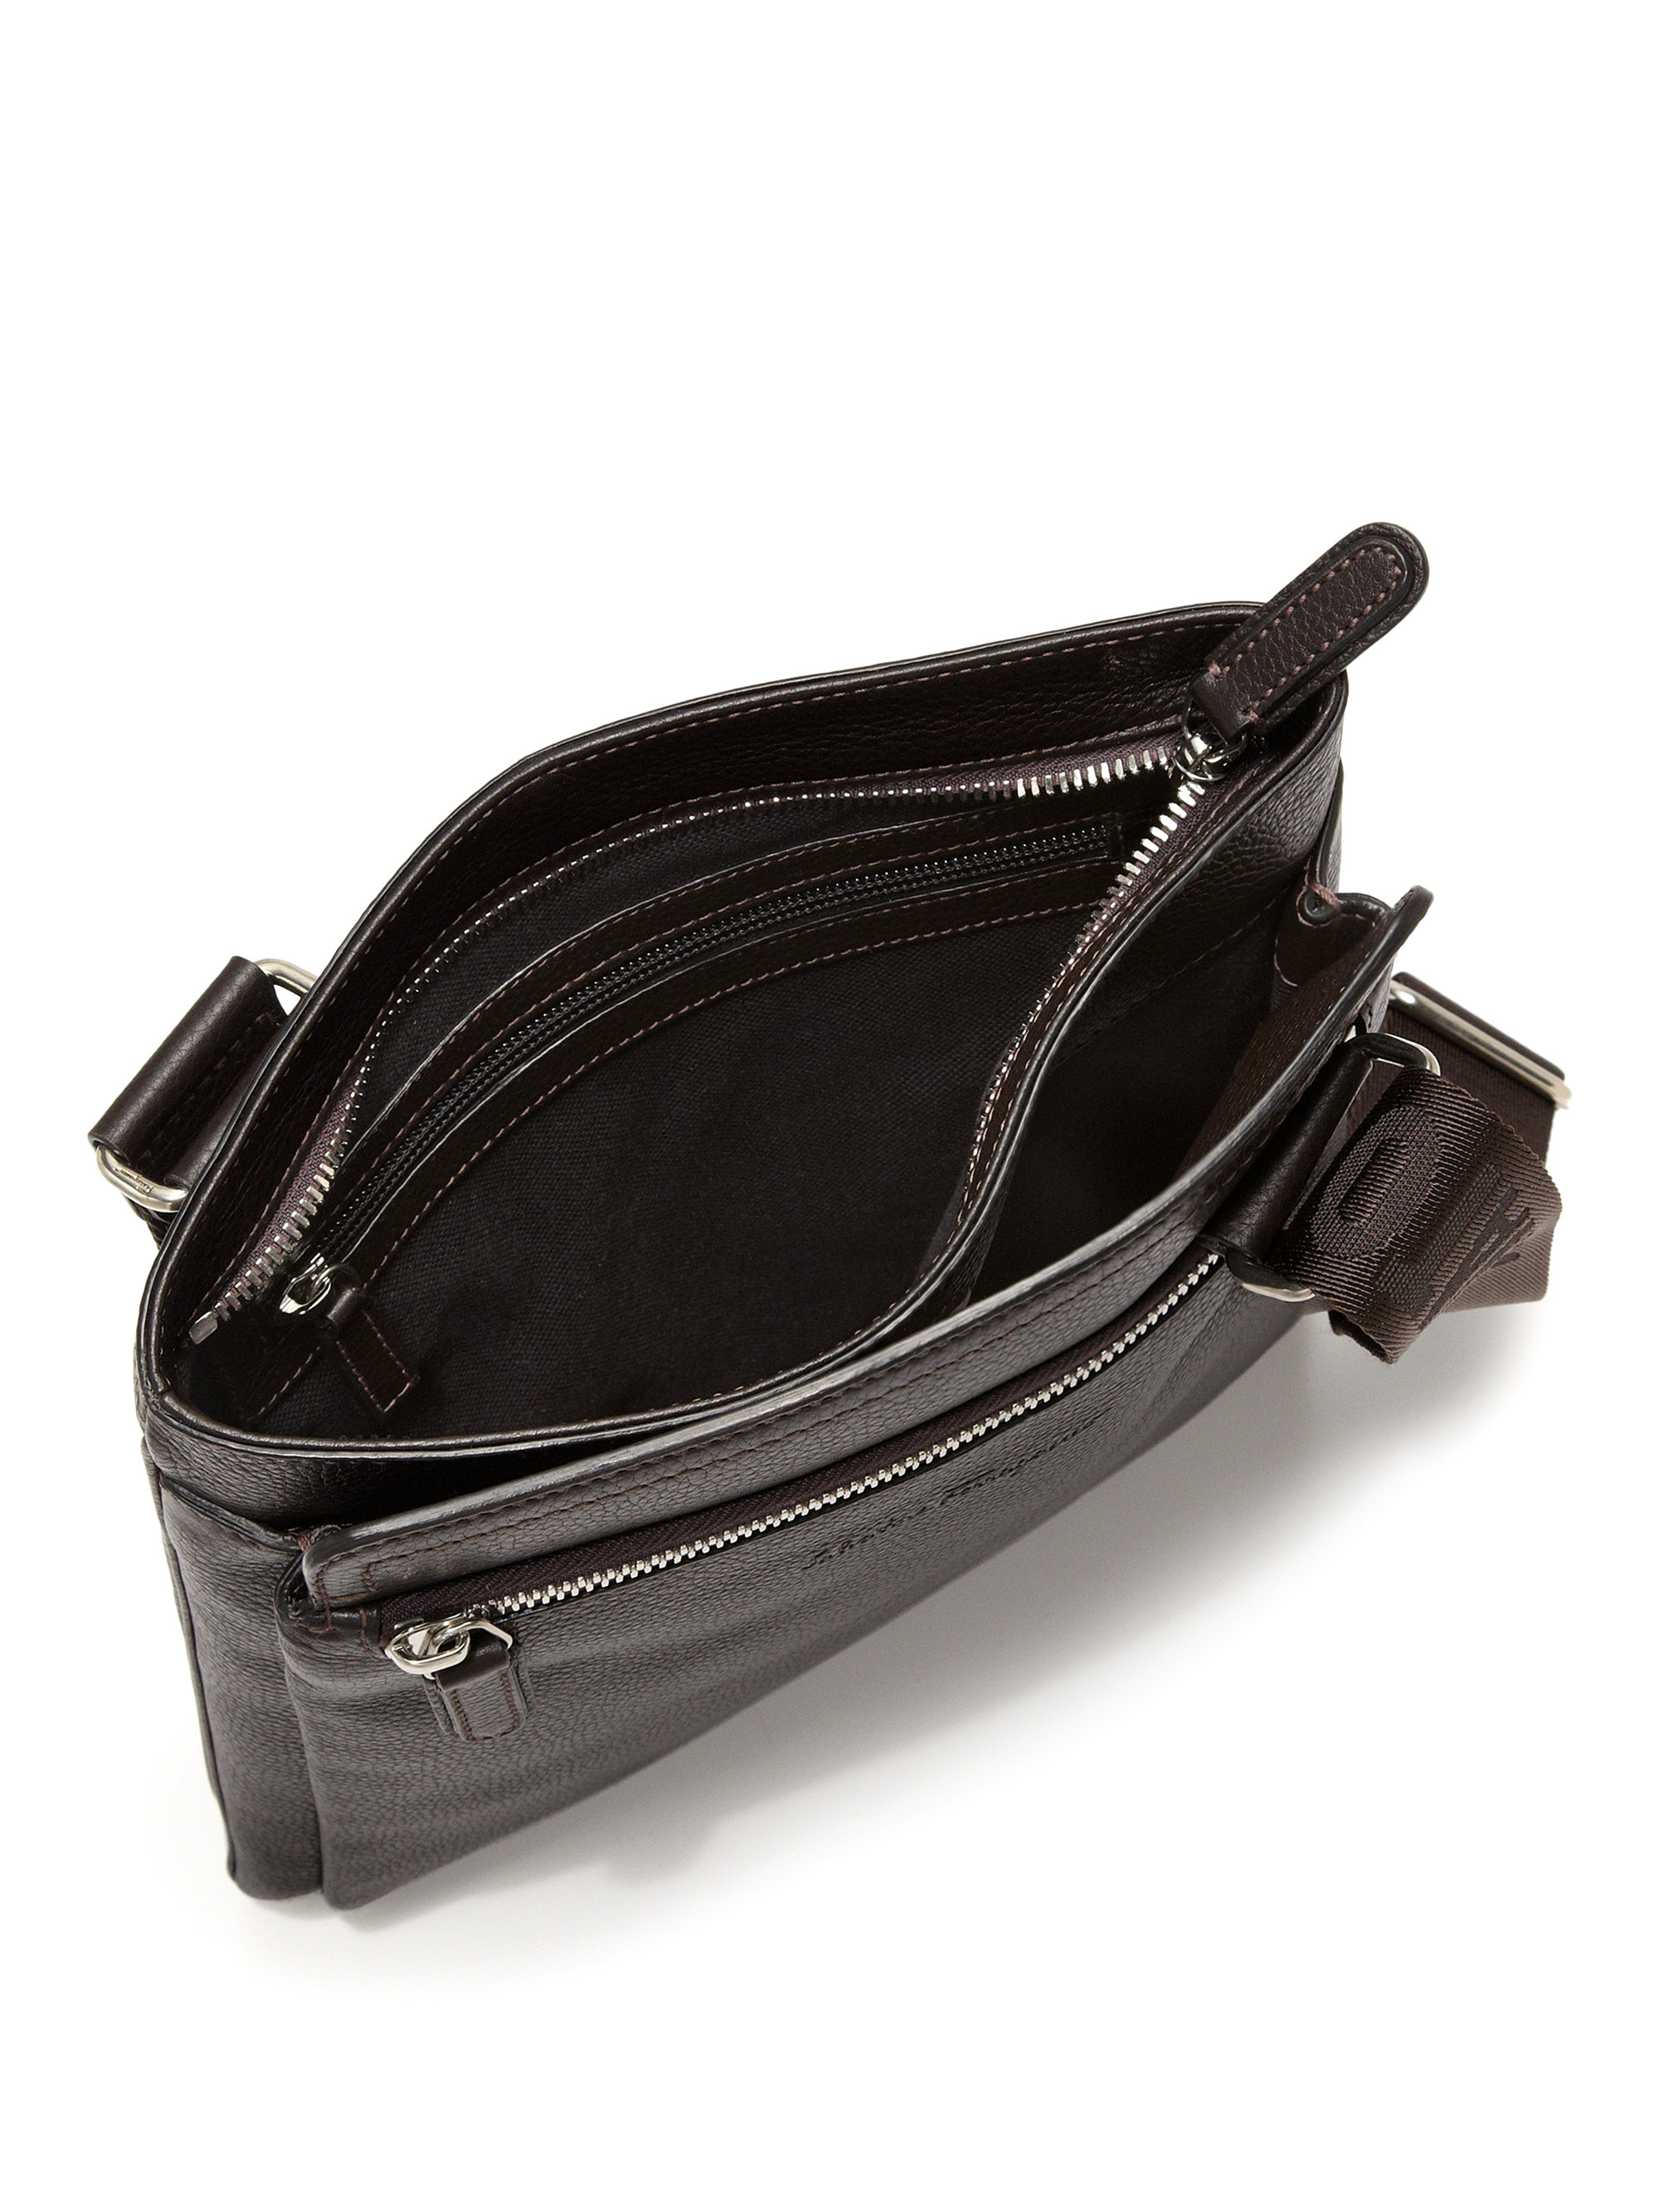 Ferragamo Manhattan Leather Crossbody Bag in Brown for Men - Lyst